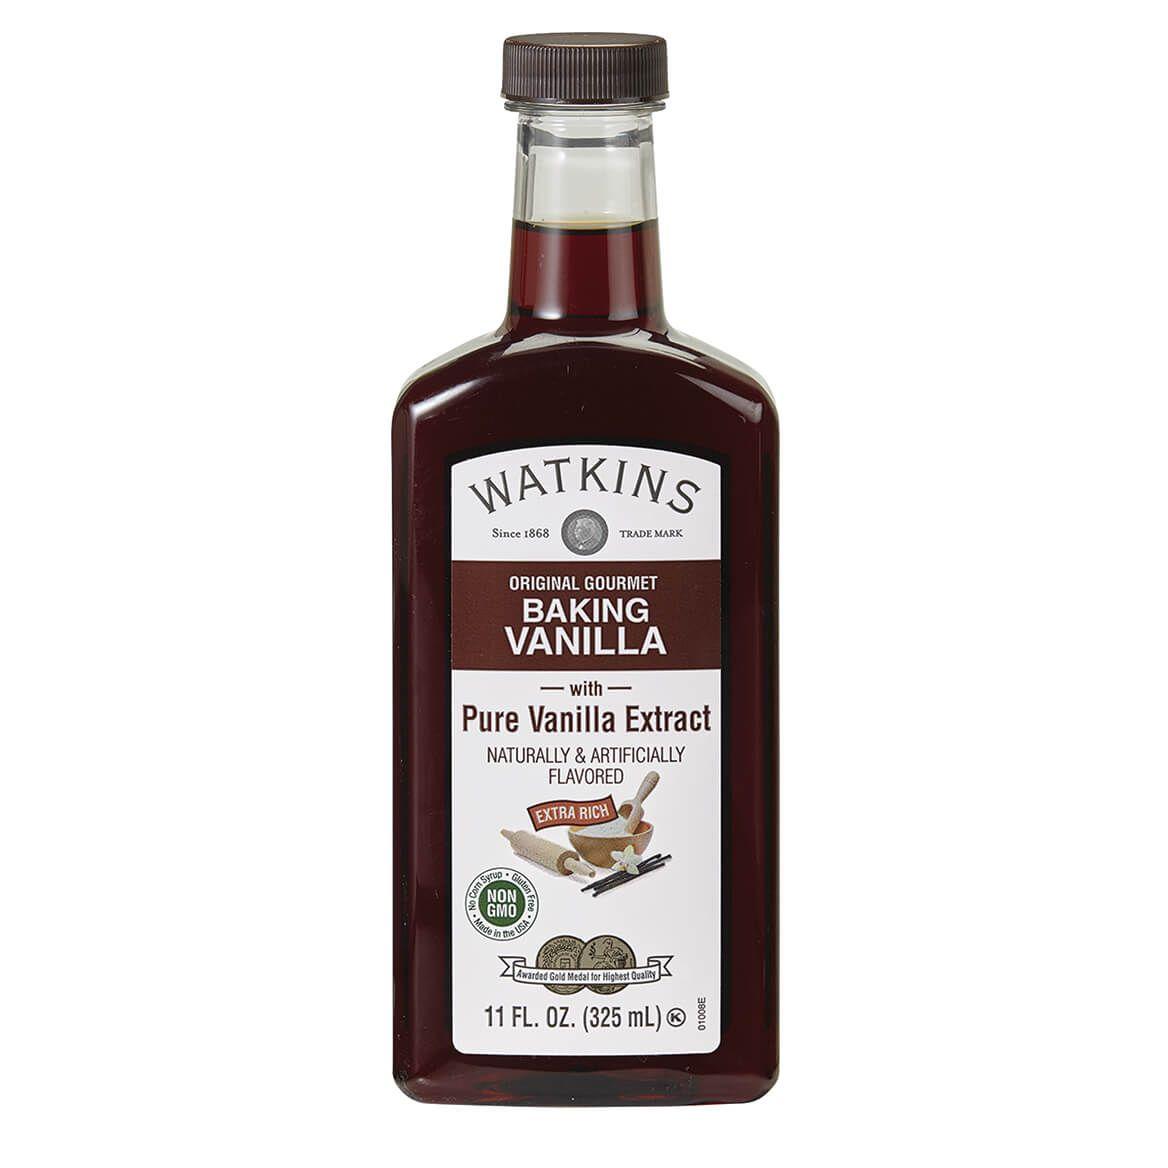 Watkins Original Baking Vanilla Extract, 11 oz.-364267